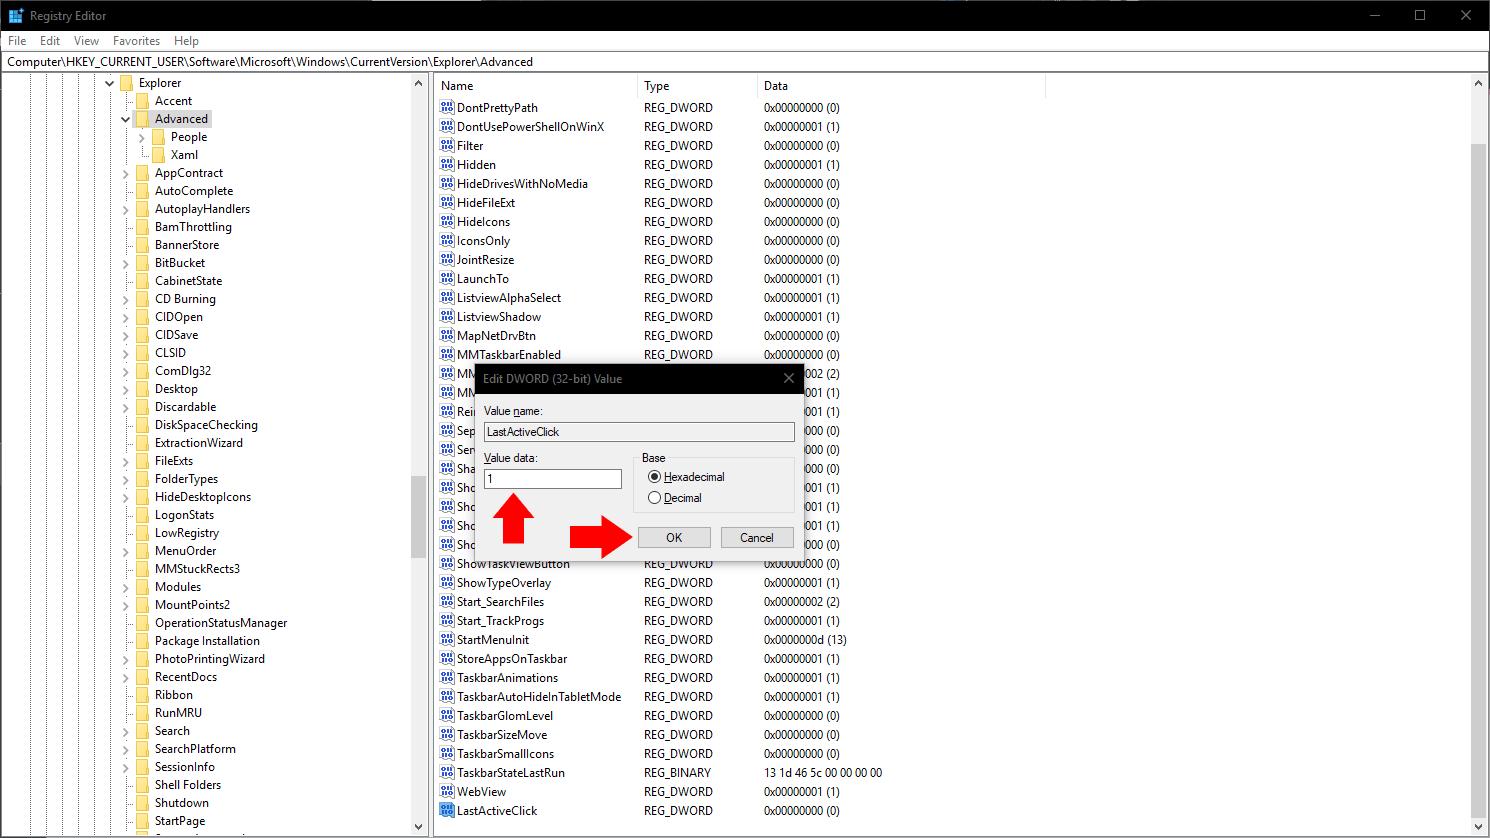 Registry editing to make taskbar icons open last active window on click